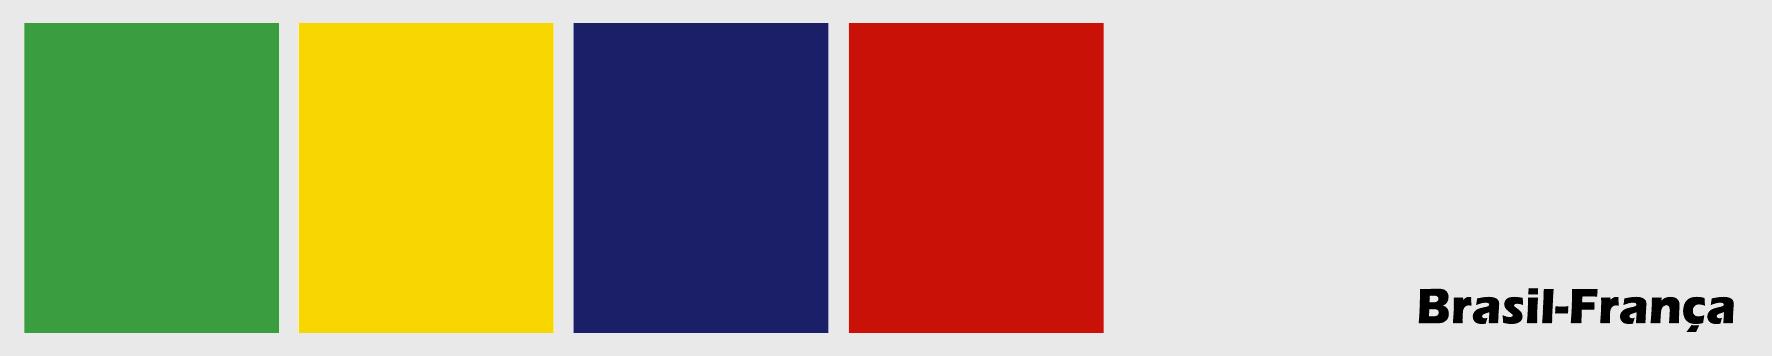 Brasil - França Capa 3a